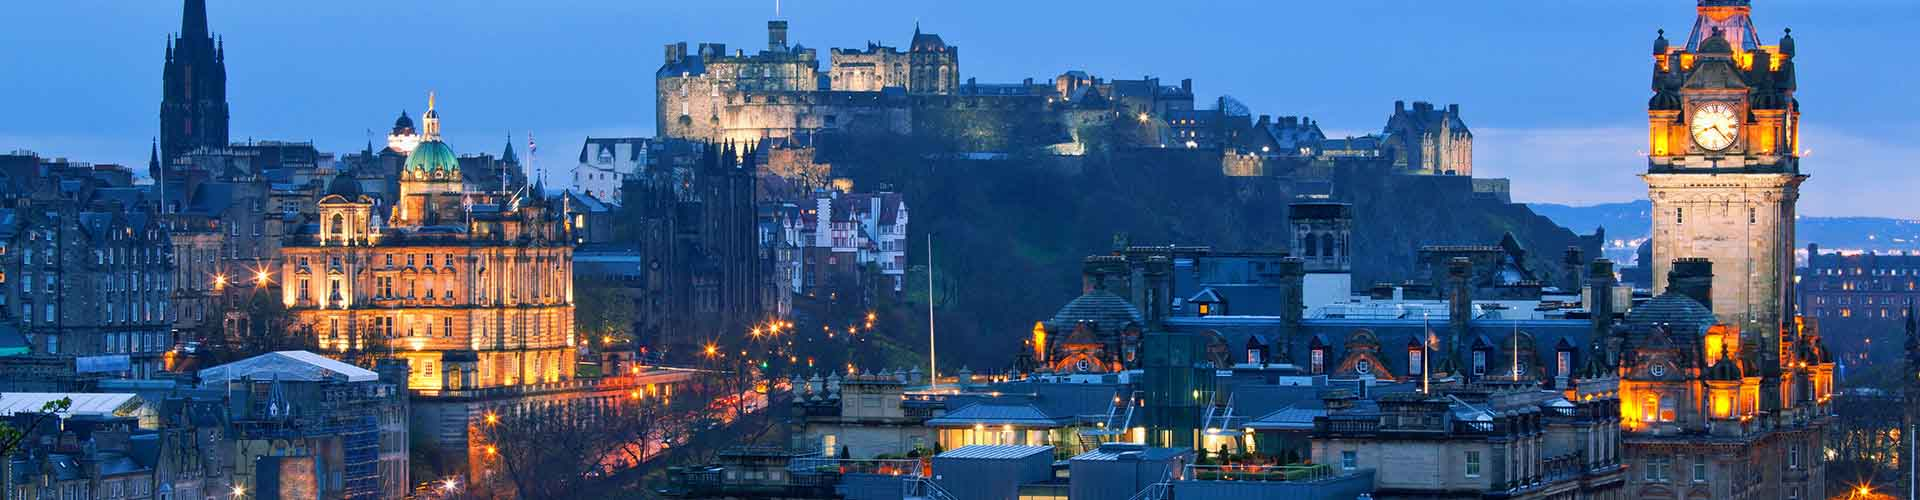 Edimburgo - Albergues en Edimburgo. Mapas de Edimburgo, Fotos y Comentarios para cada Albergue en Edimburgo.